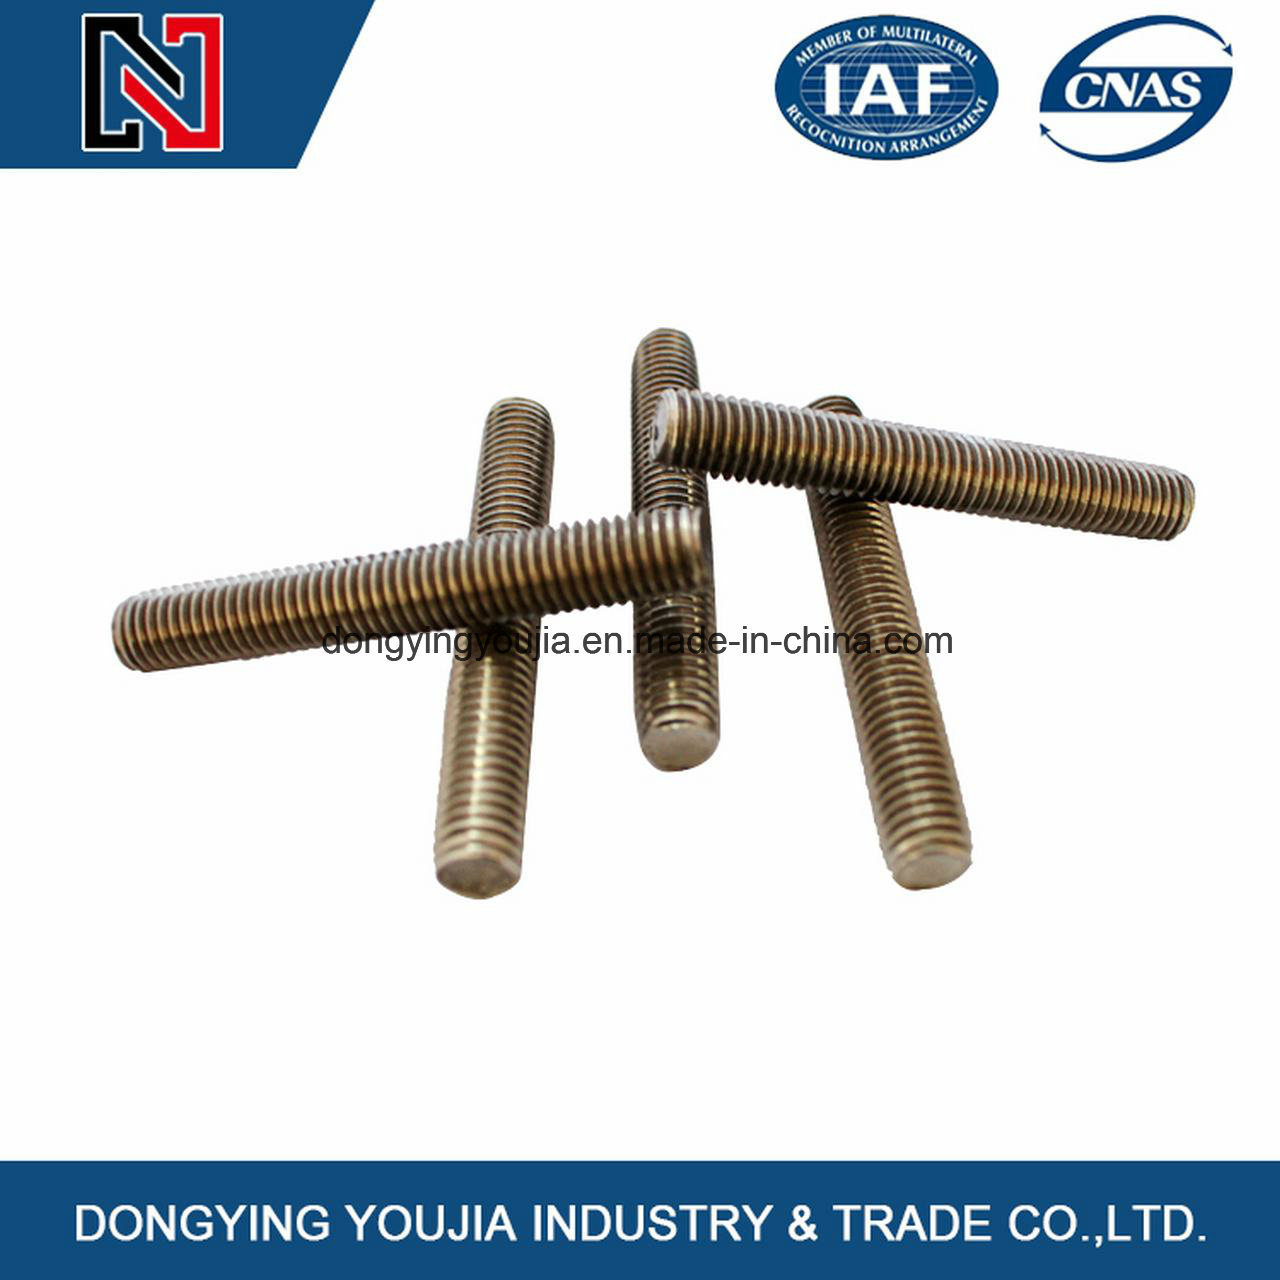 Full Threaded Hot DIP Galvanized Threaded Rod